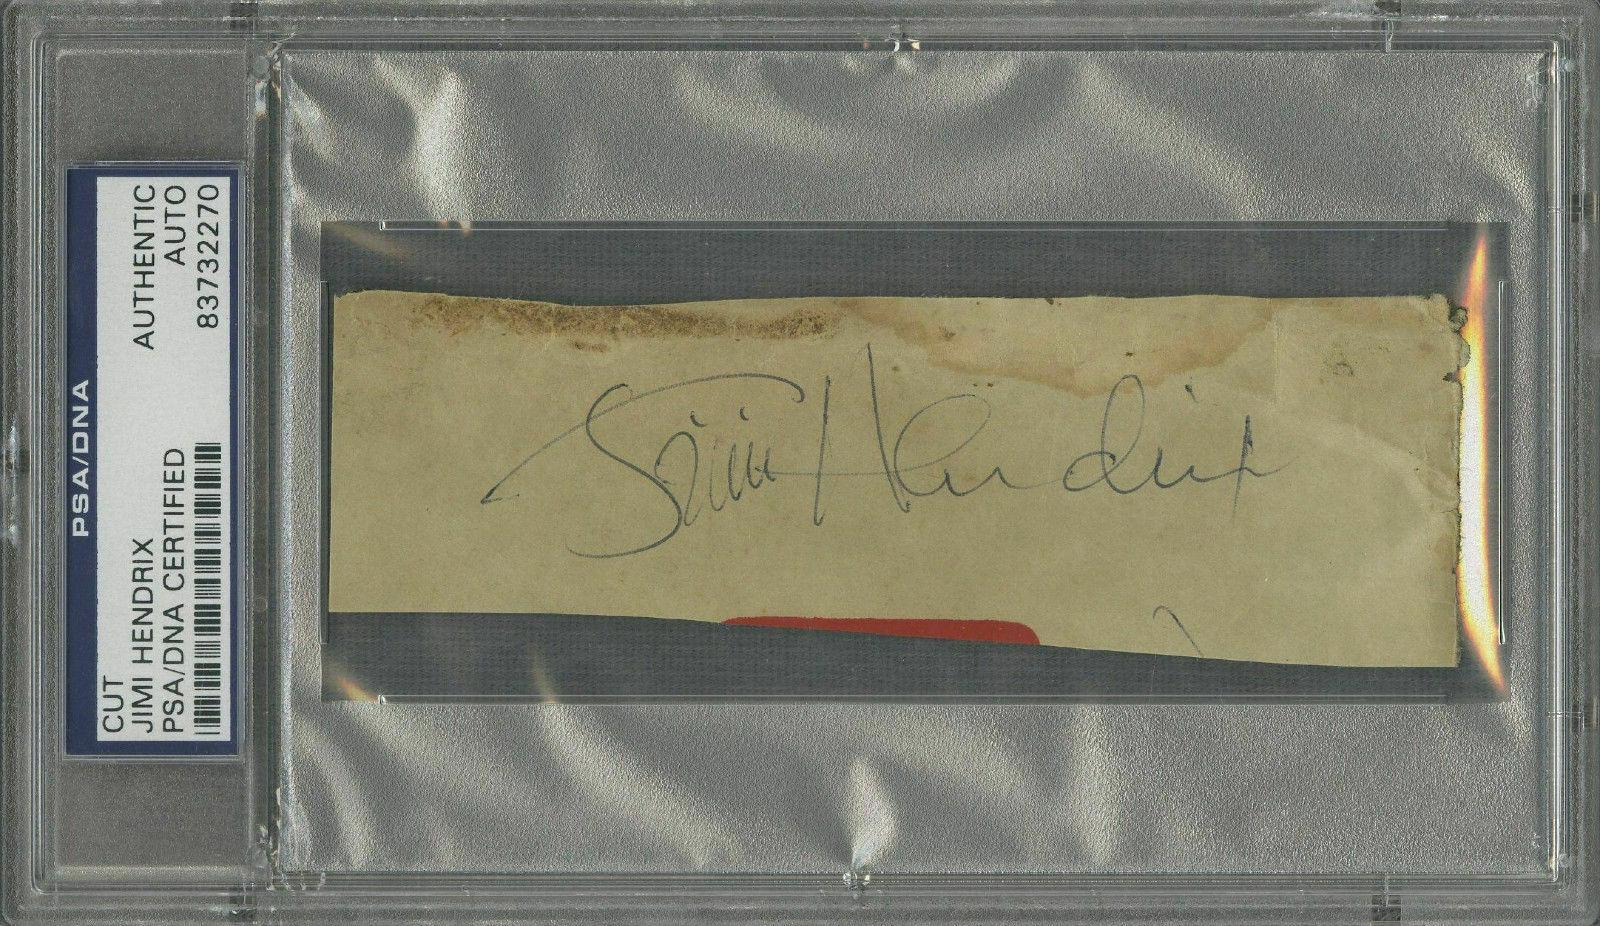 Jimi Hendrix Signed Autographed 1x3 Album Page PSA/DNA Authentic